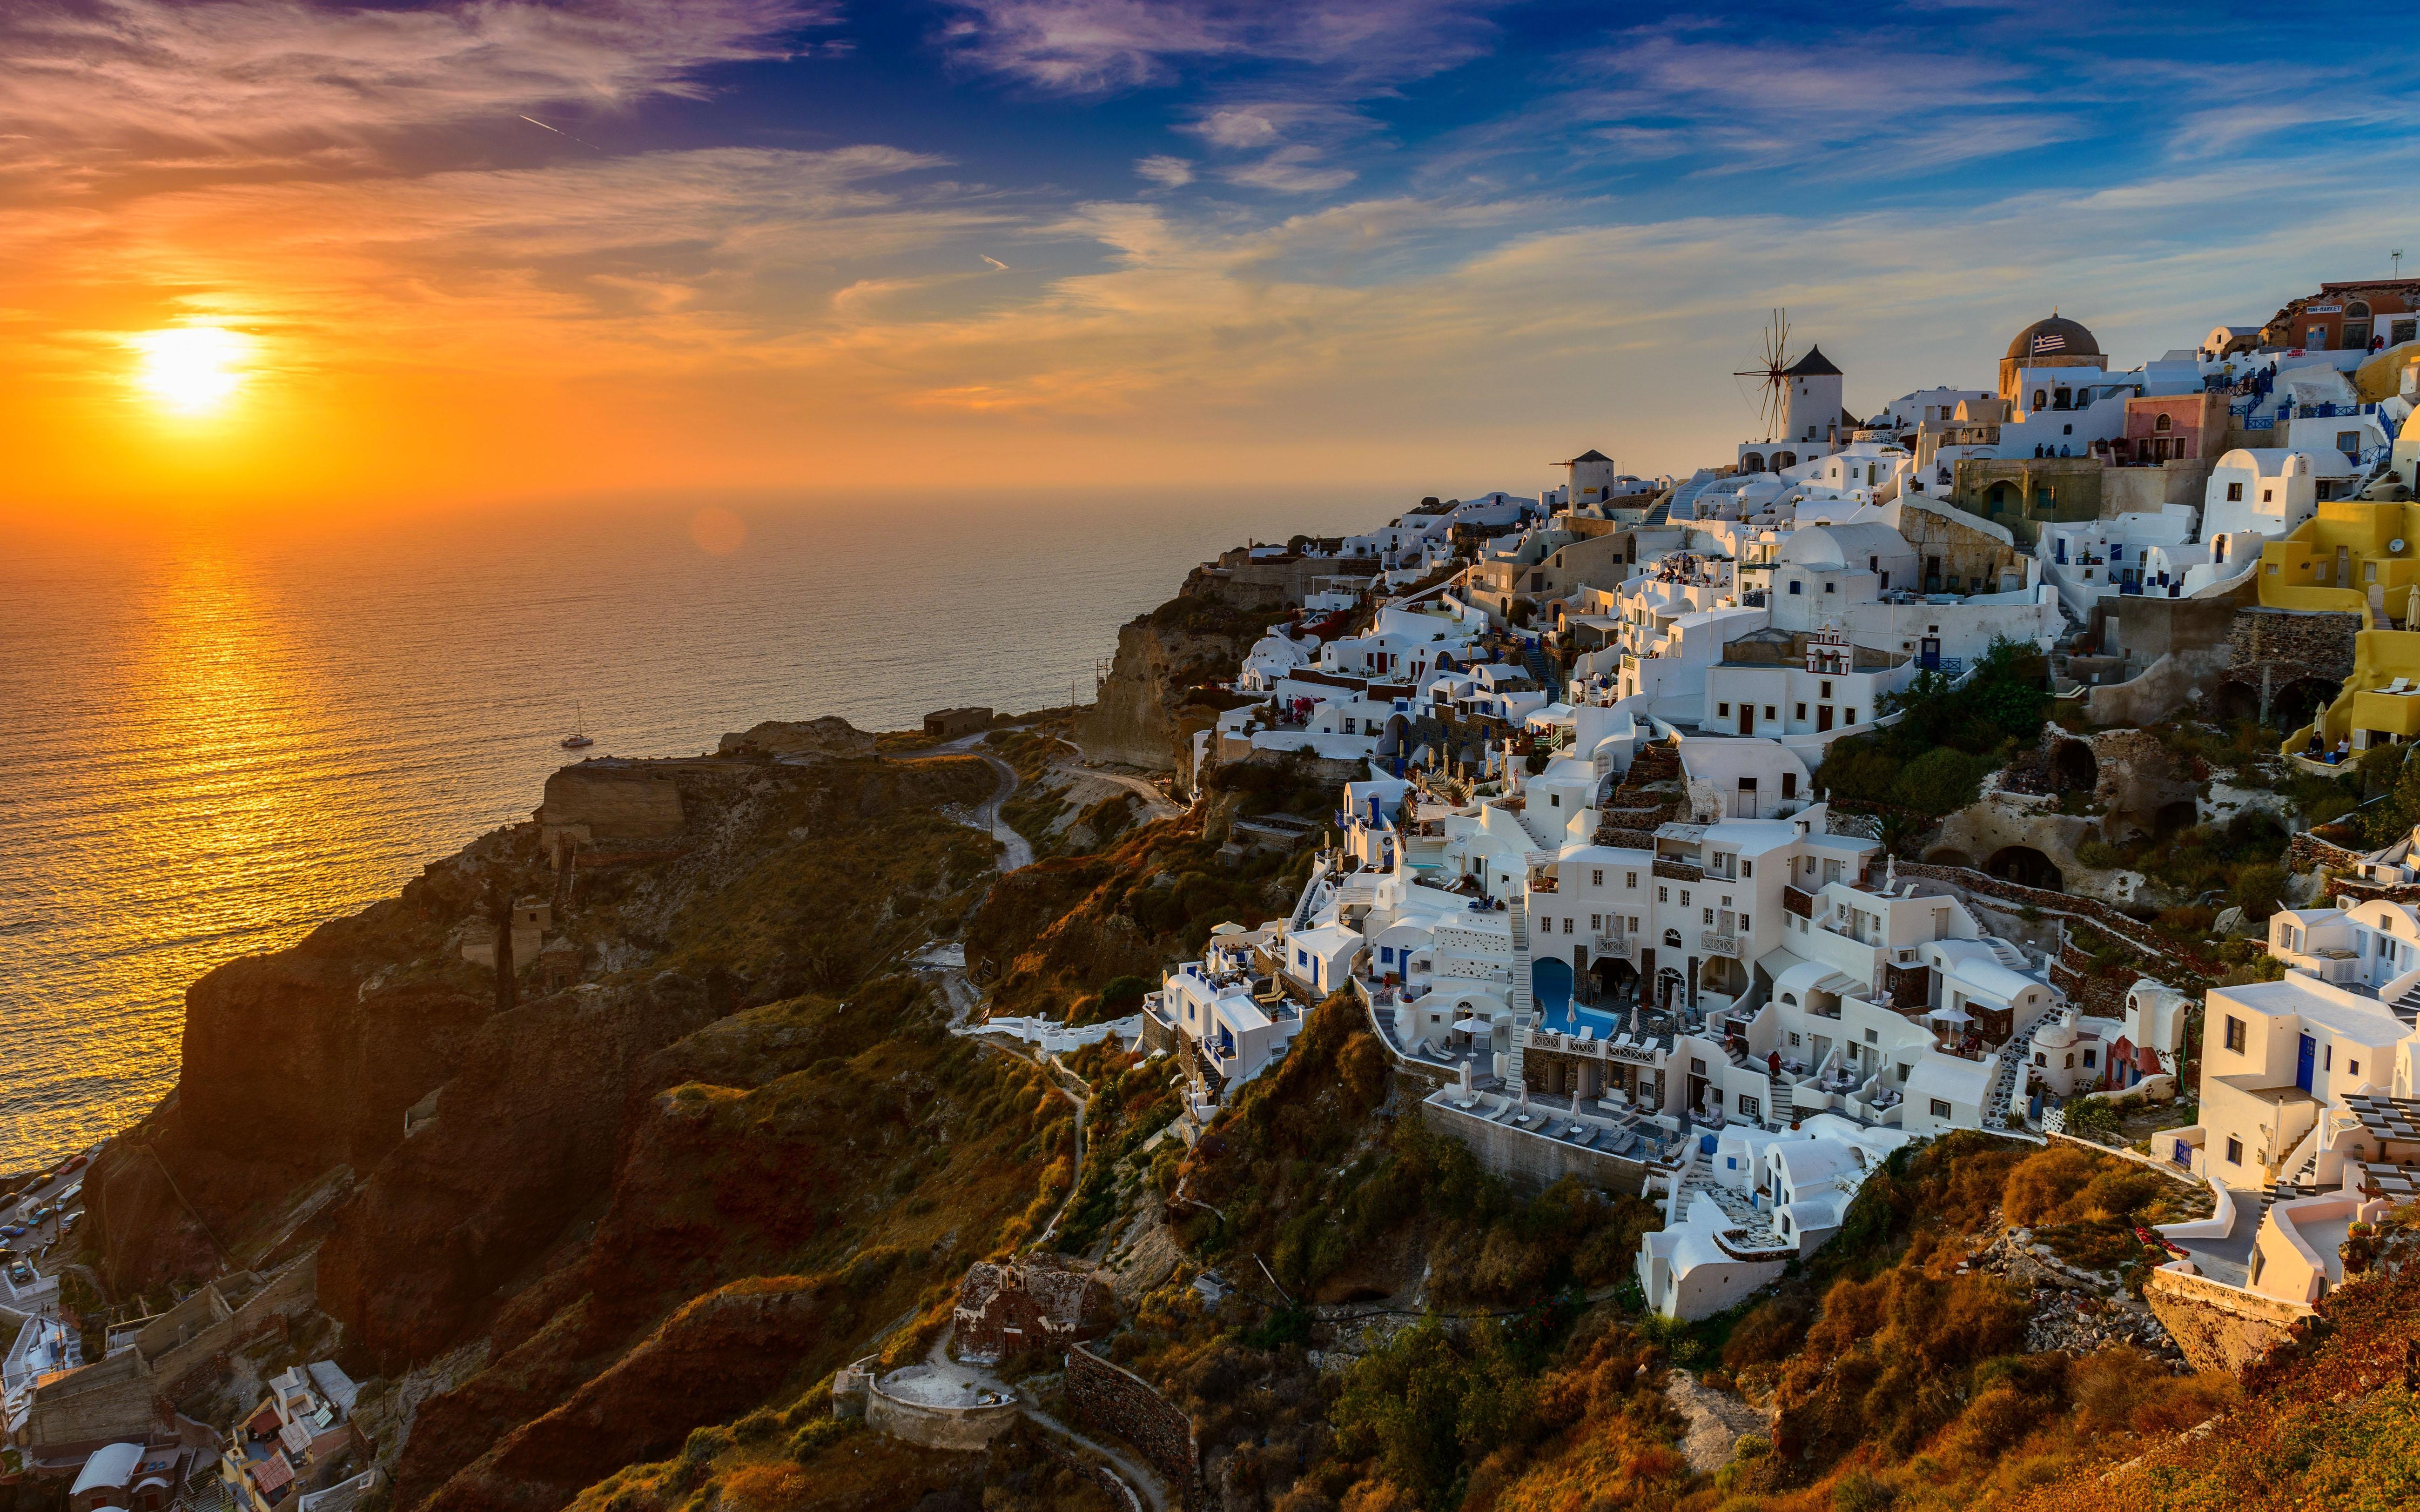 Hong Kong Iphone X Wallpaper Santorini Island In Greece Aegean Sea Sunset Desktop